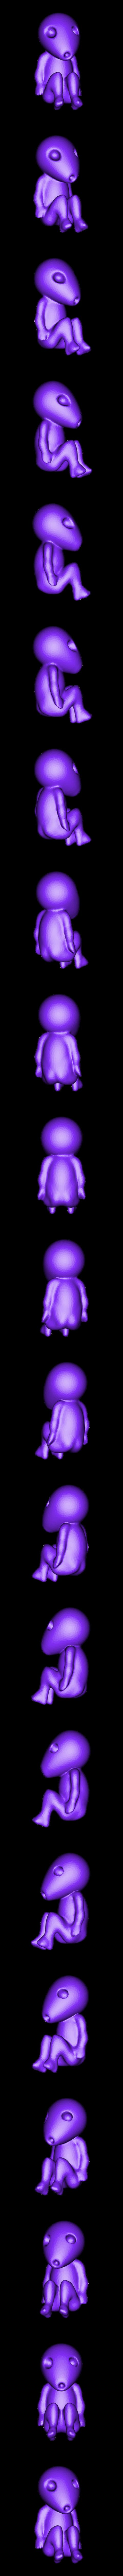 kodama pose 6.OBJ Download OBJ file Glowing Kodama Princess Mononoke Luminous Tree Elves. (6 poses) • 3D print object, paulienet